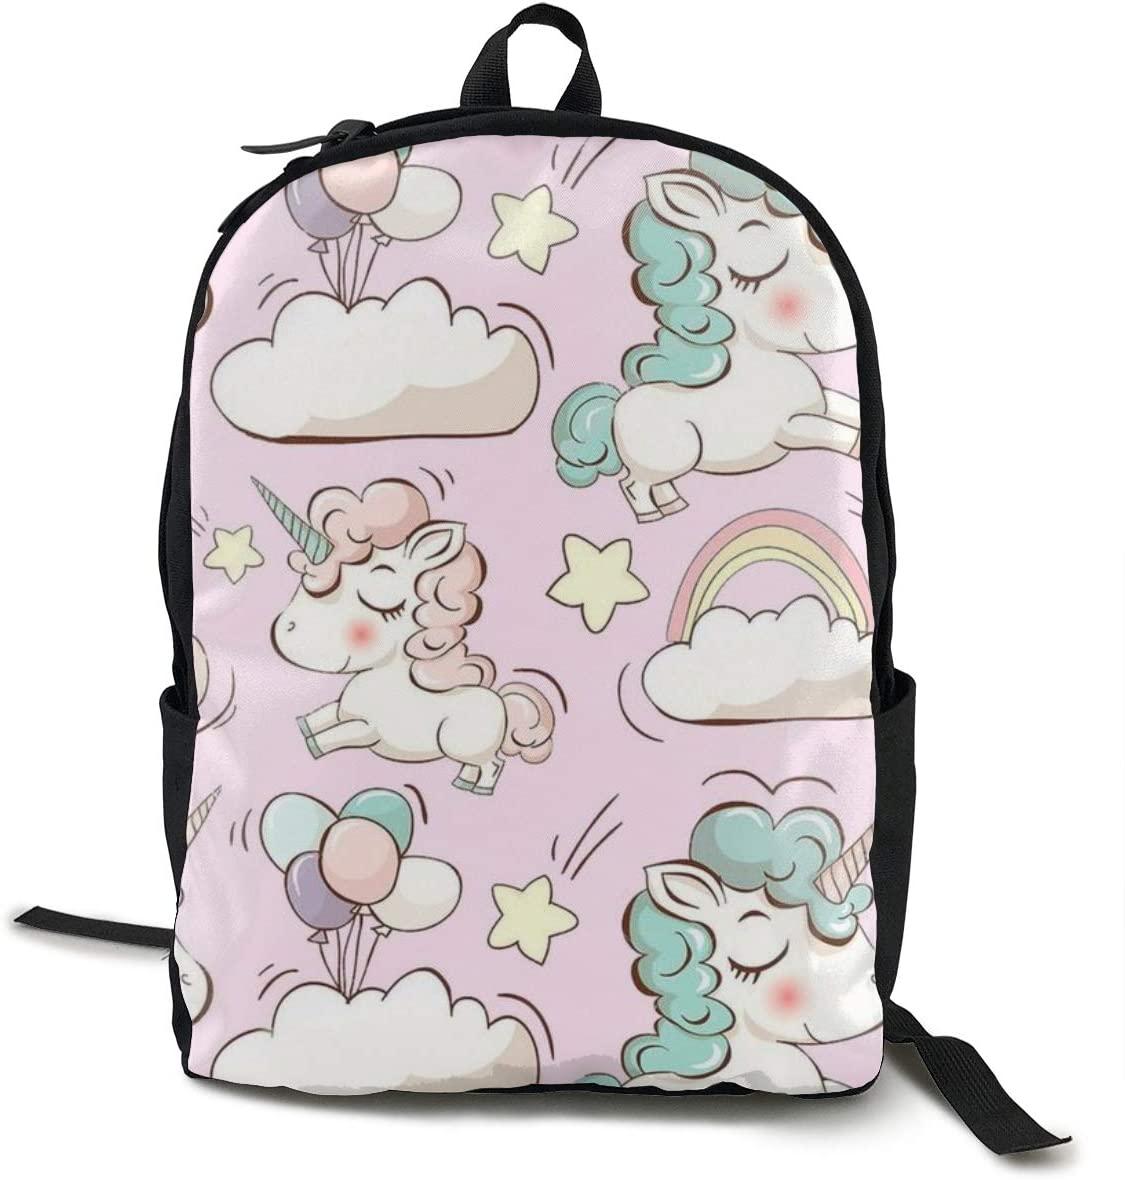 NiYoung Women Men Teens Water Resistant Anti-Theft Laptop Backpack, Travel Business School Outdoor Rucksack Daypack (Cute Unicorn Cloud Ballon)